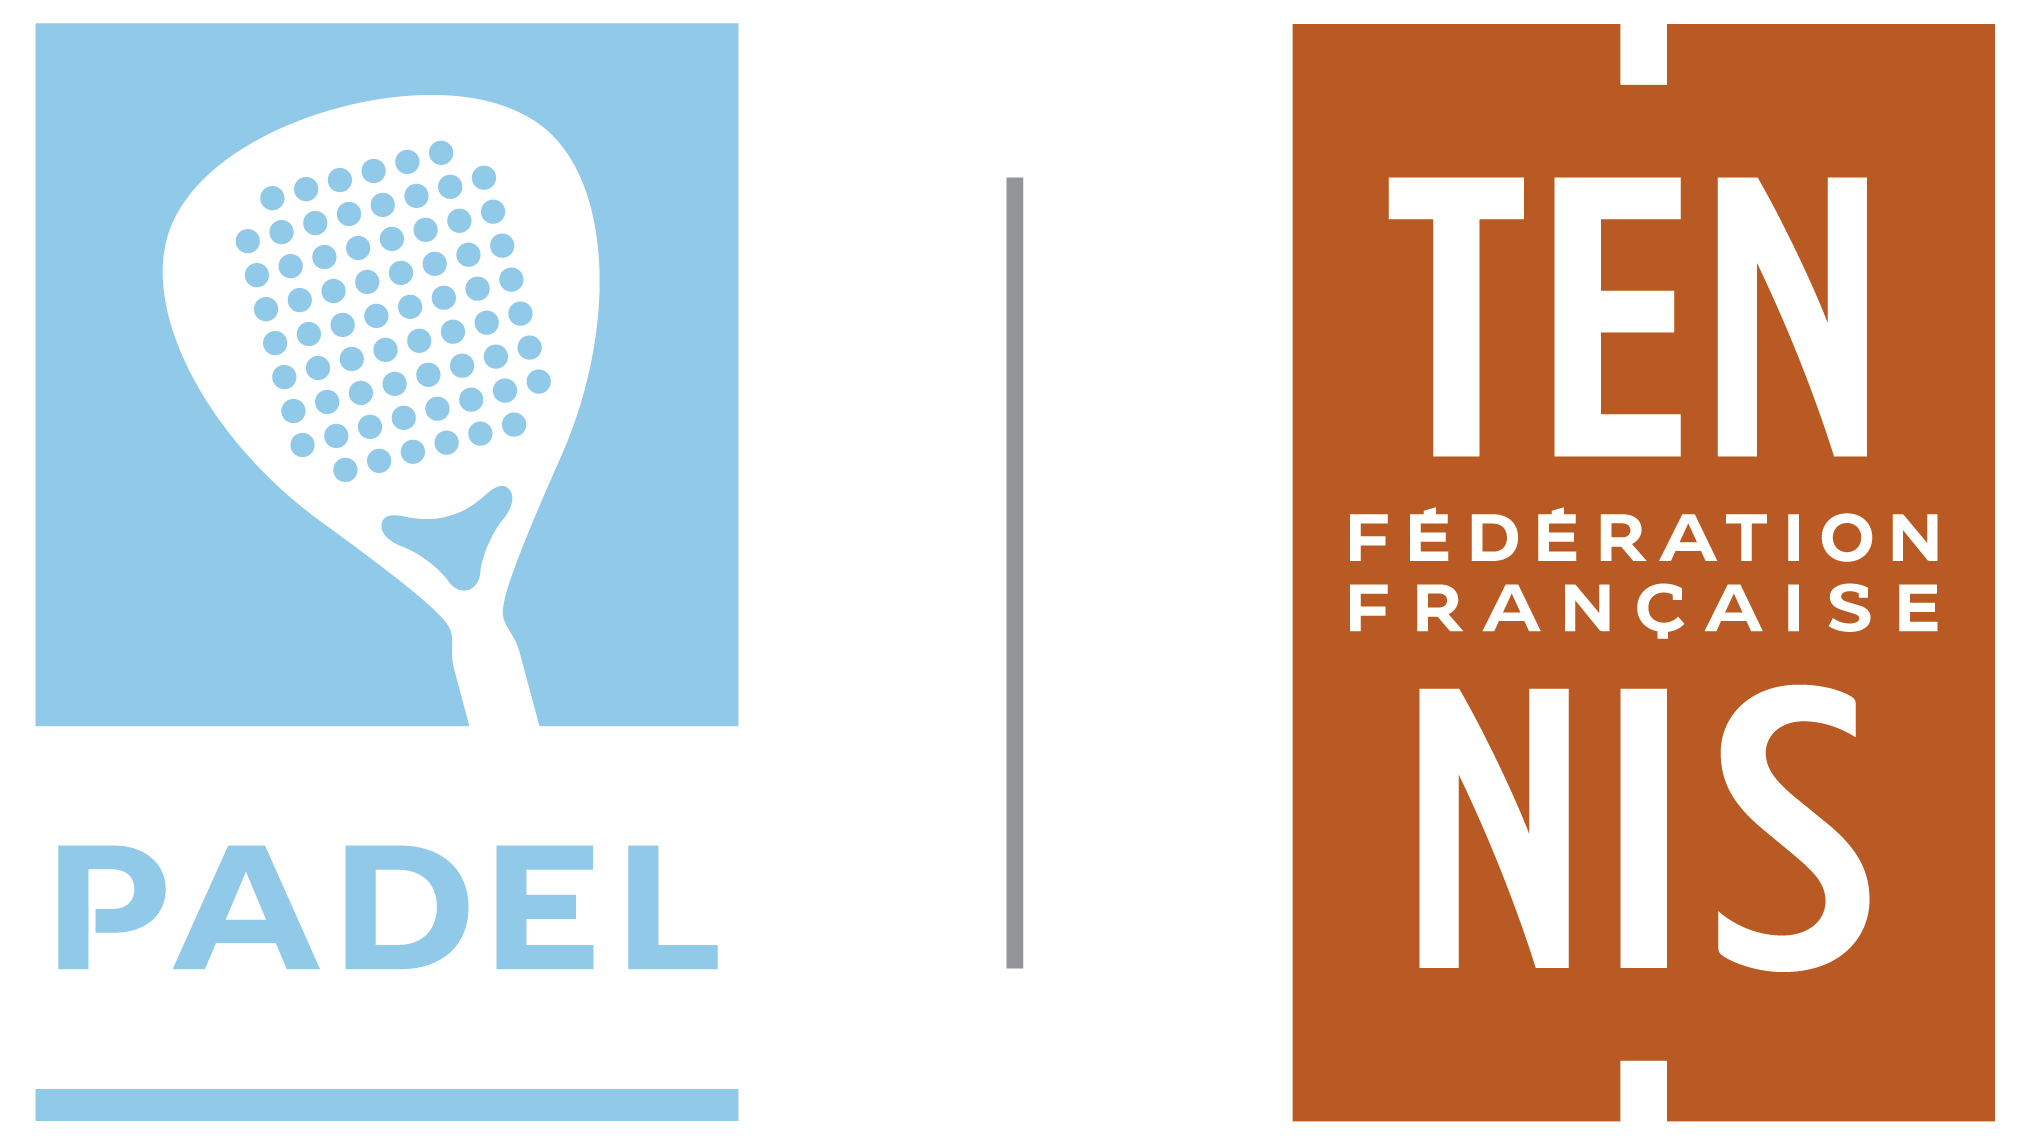 FFT-luvut: padel edistyy edelleen